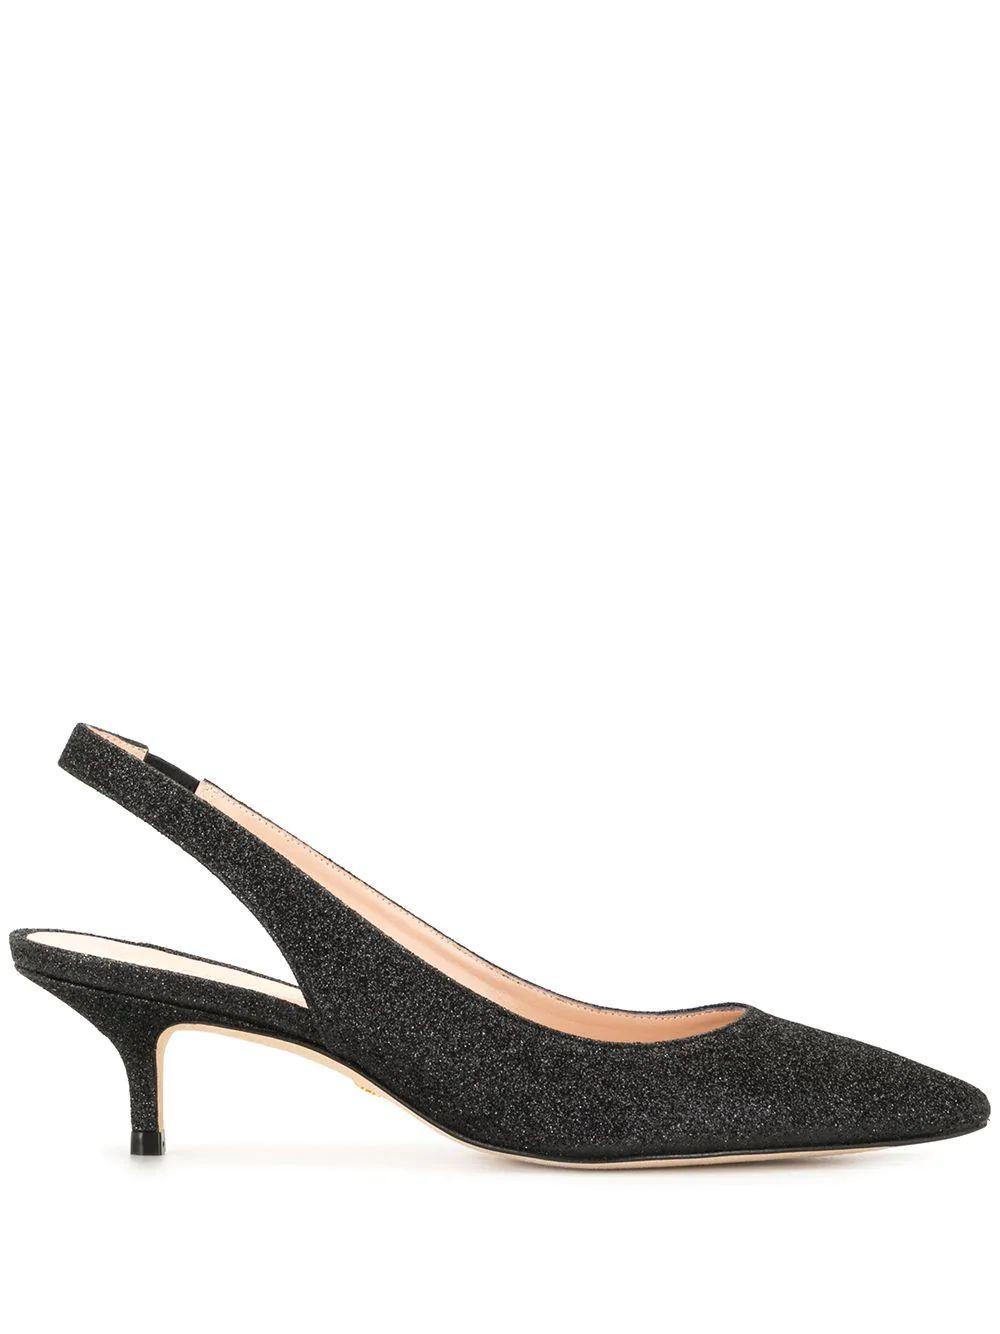 Estela 50 Glitter Slingback Heels Item # ESTELA50